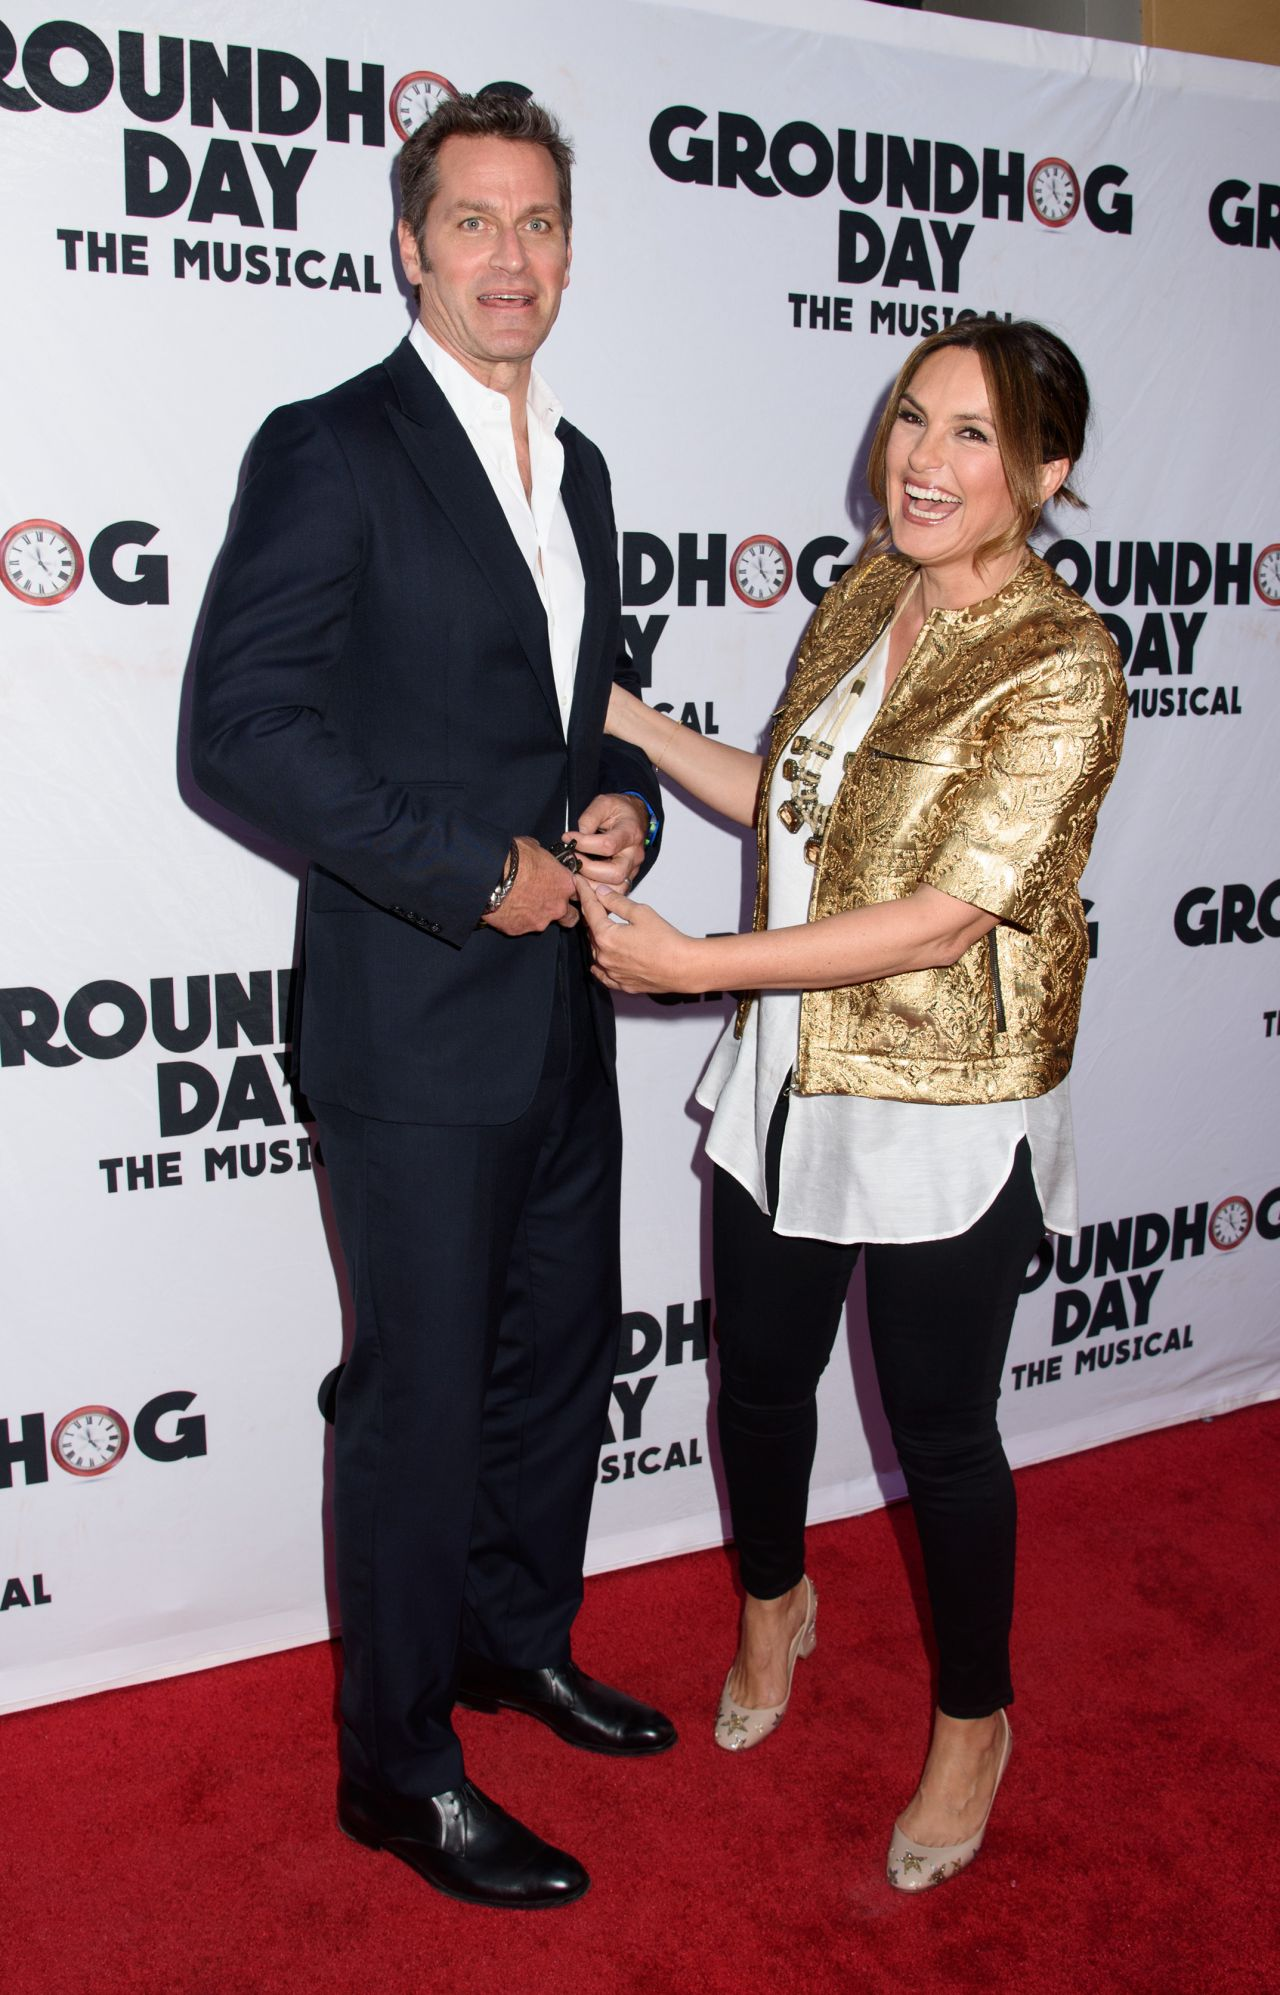 Mariska Hargitay Quot Groundhog Day Quot The Musical In New York